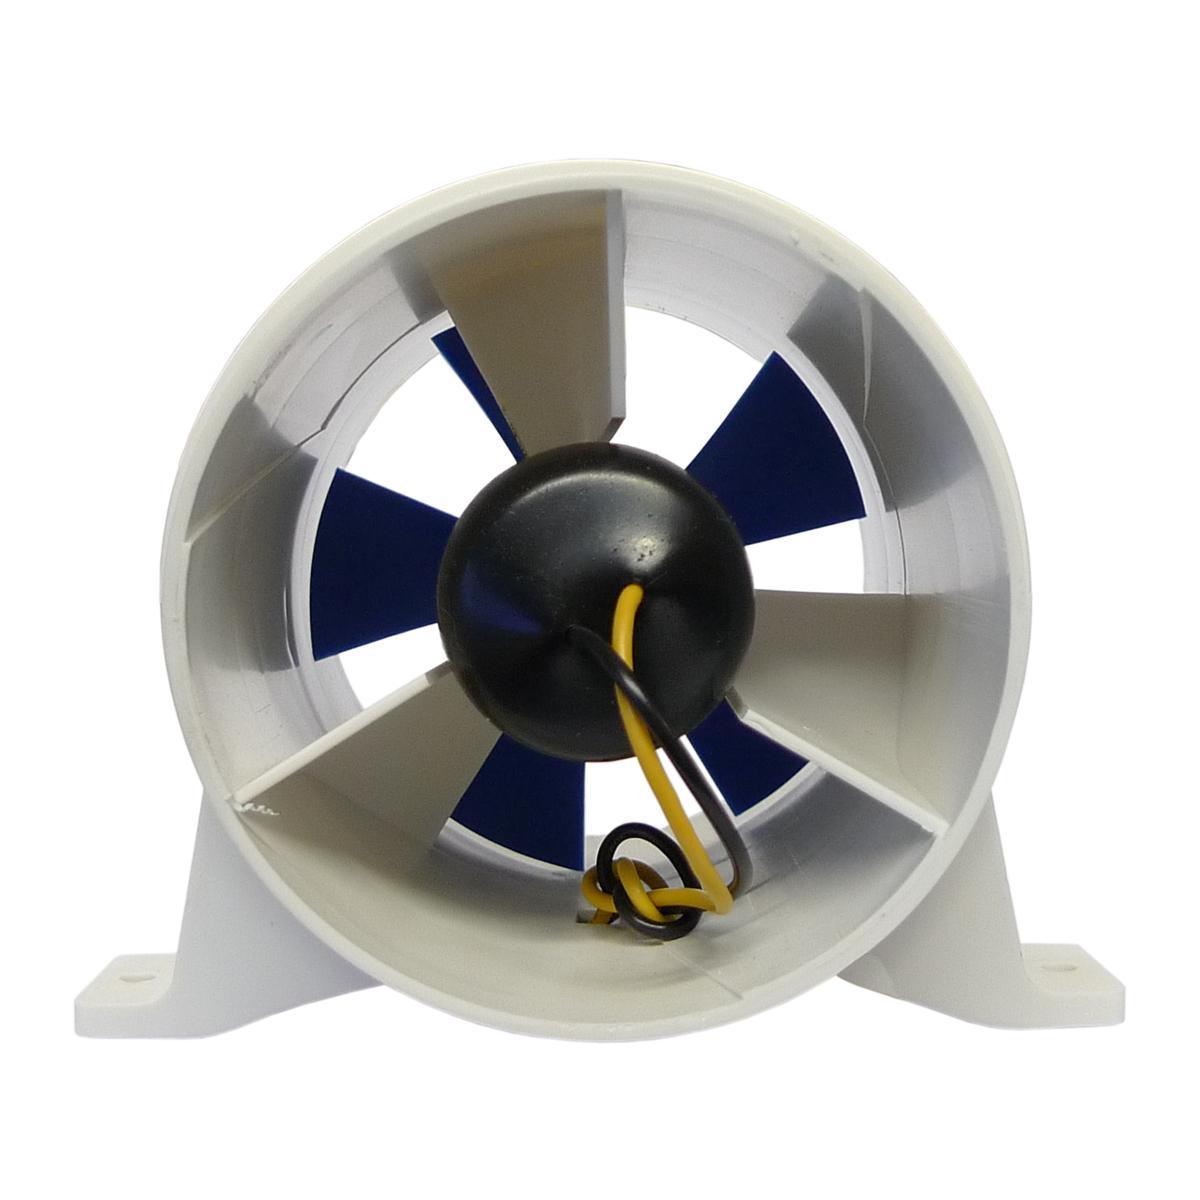 76mm in line blower fan cwp140 von merlin motorsport. Black Bedroom Furniture Sets. Home Design Ideas